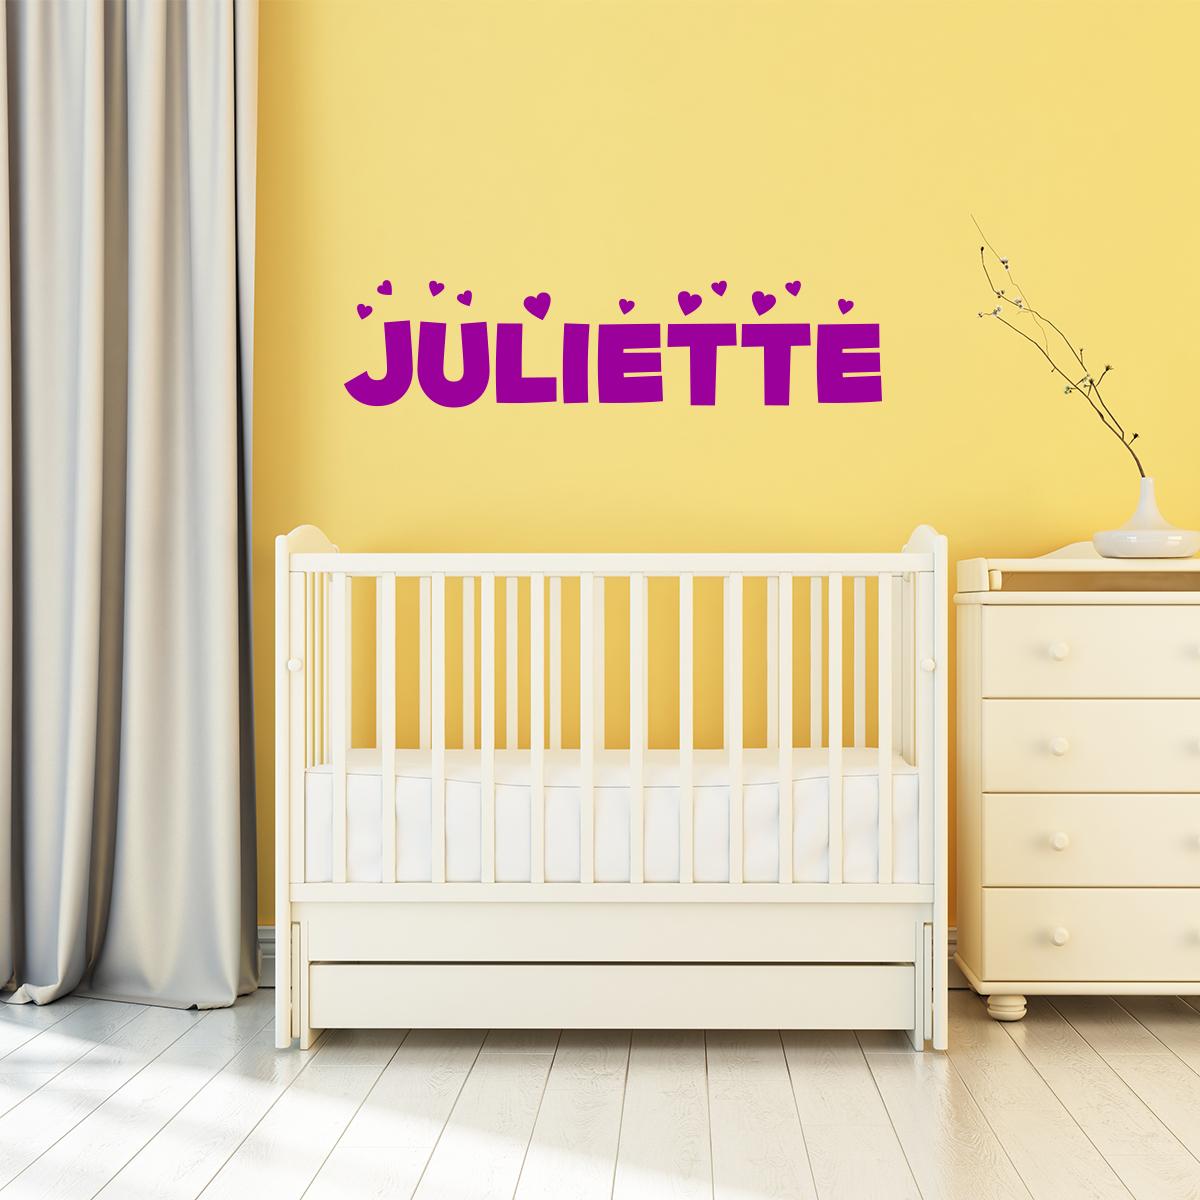 Sticker pr nom personnalisable enfants blouissant stickers chambre enfants chambre b b - Stickers prenom porte chambre ...